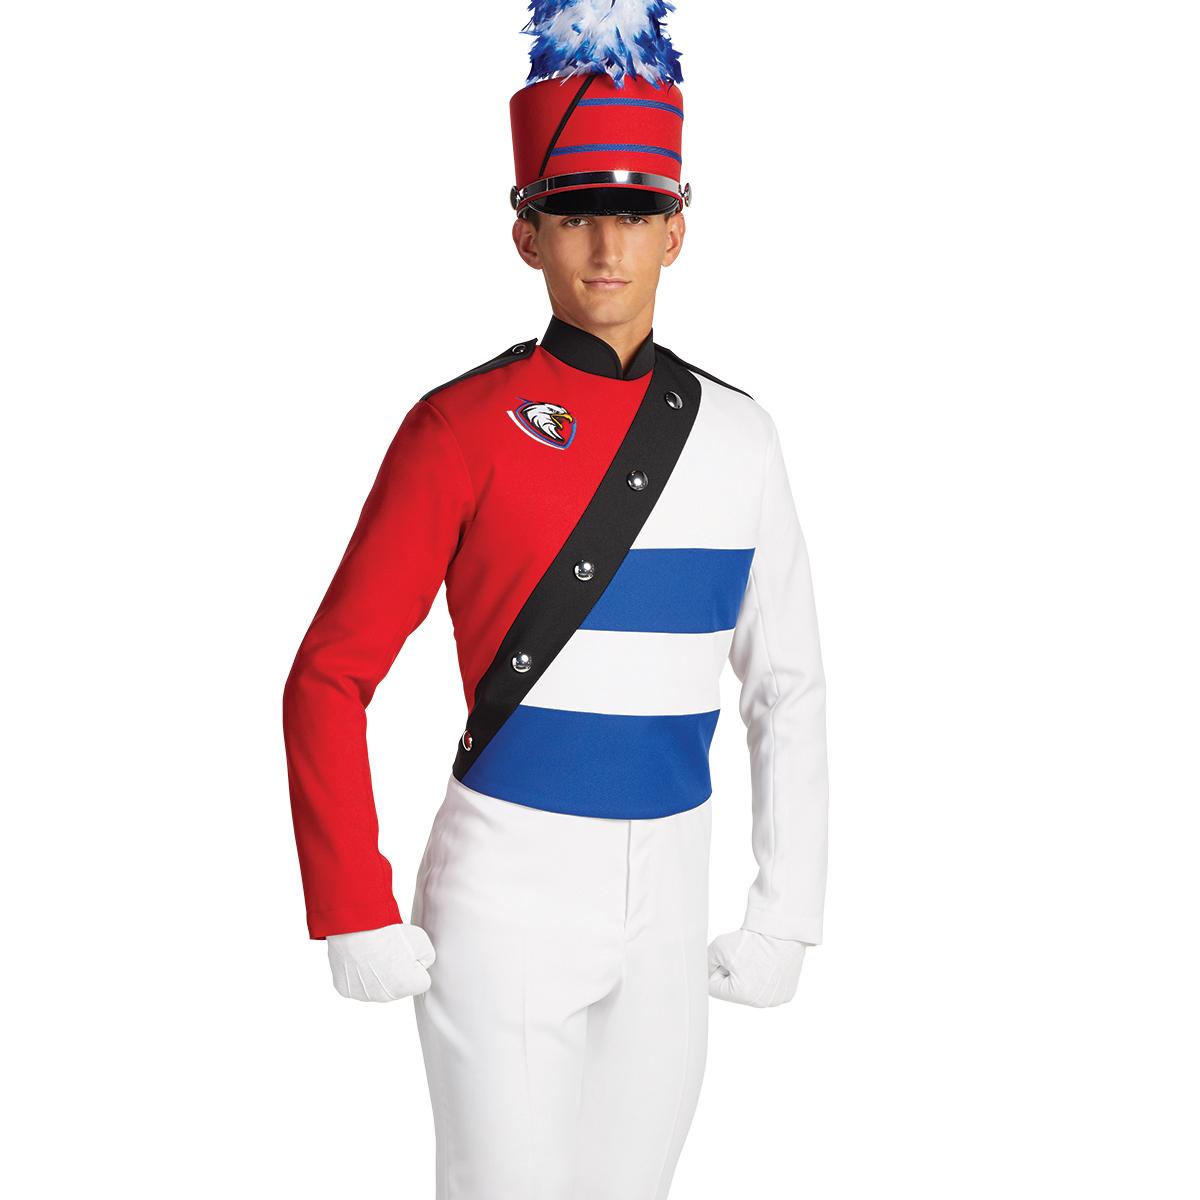 Color Guard Uniform Dress GS1643 at Band Shoppe (With ...  |Band Shoppe Uniforms